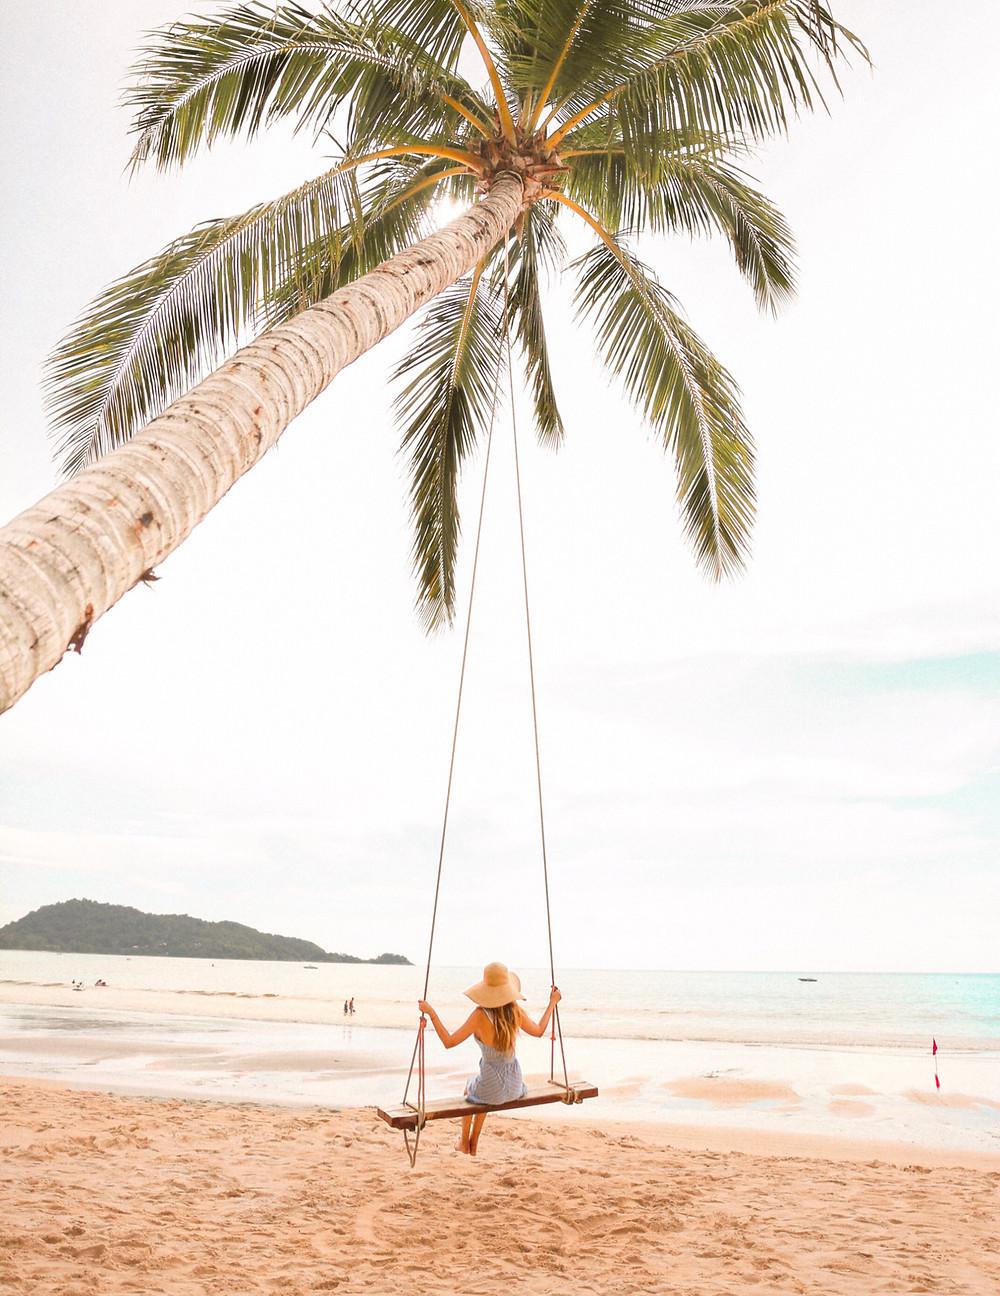 swing on palm tree on Kata beach, Phuket